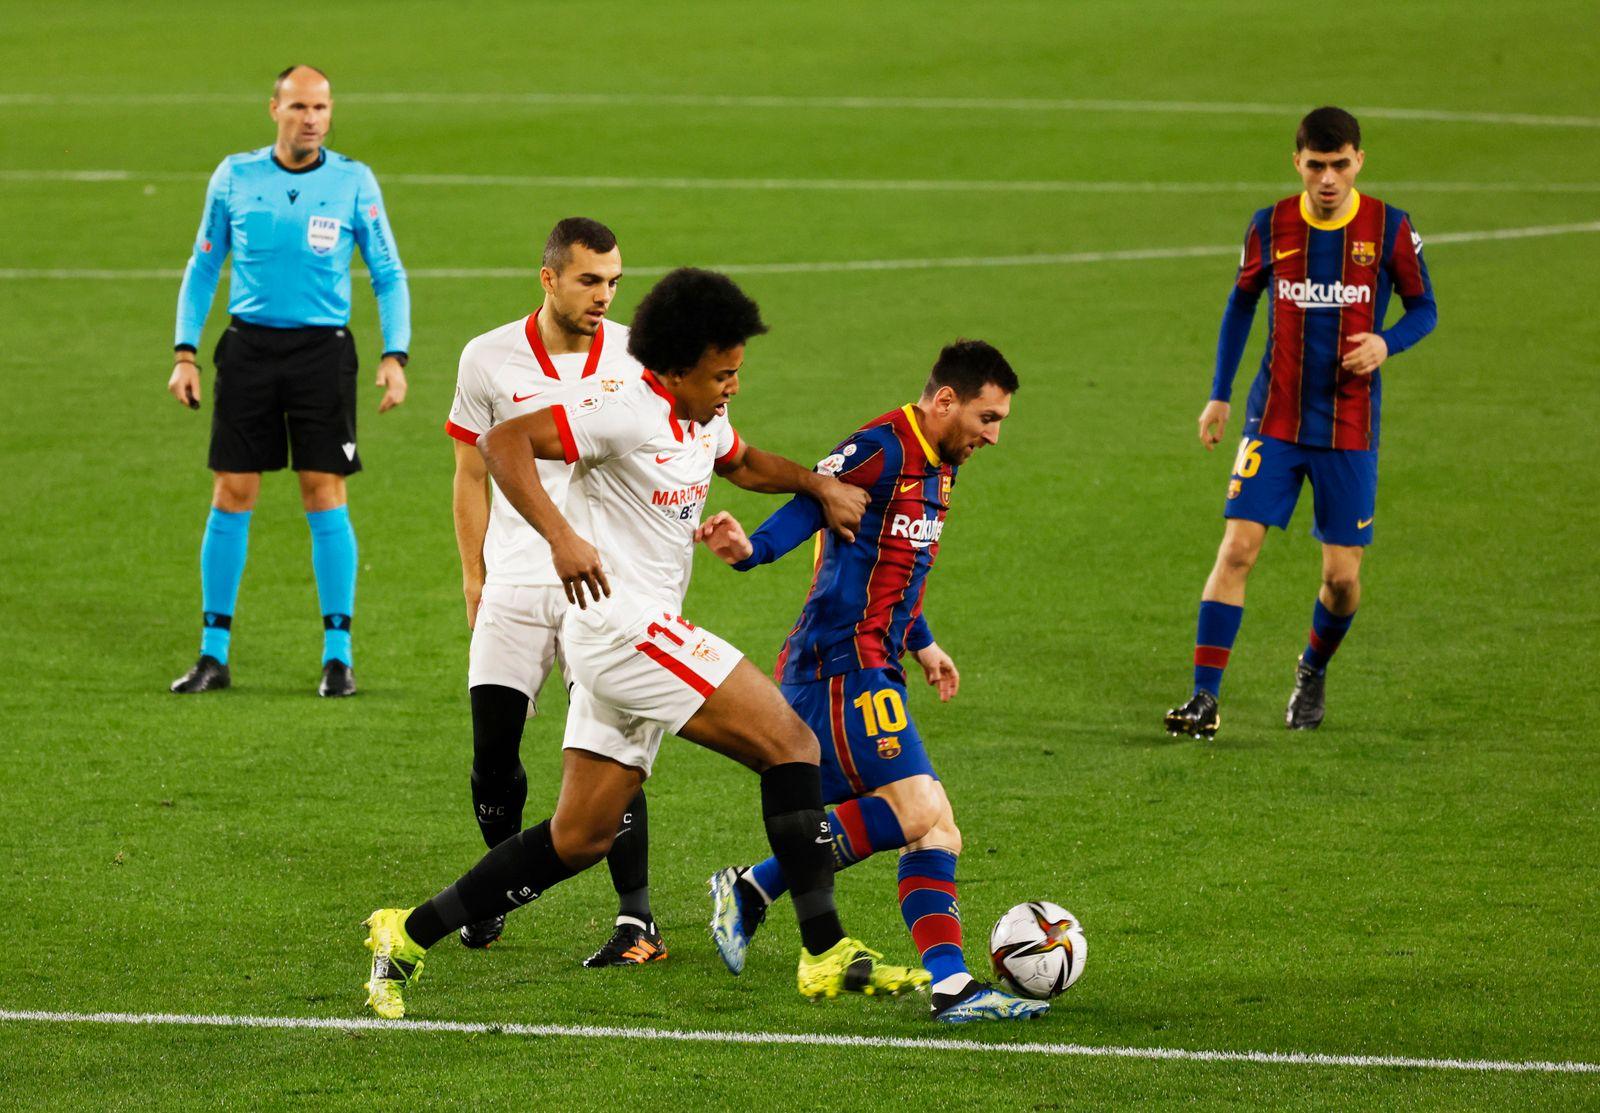 Copa del Rey - Semi Final First Leg - Sevilla v FC Barcelona